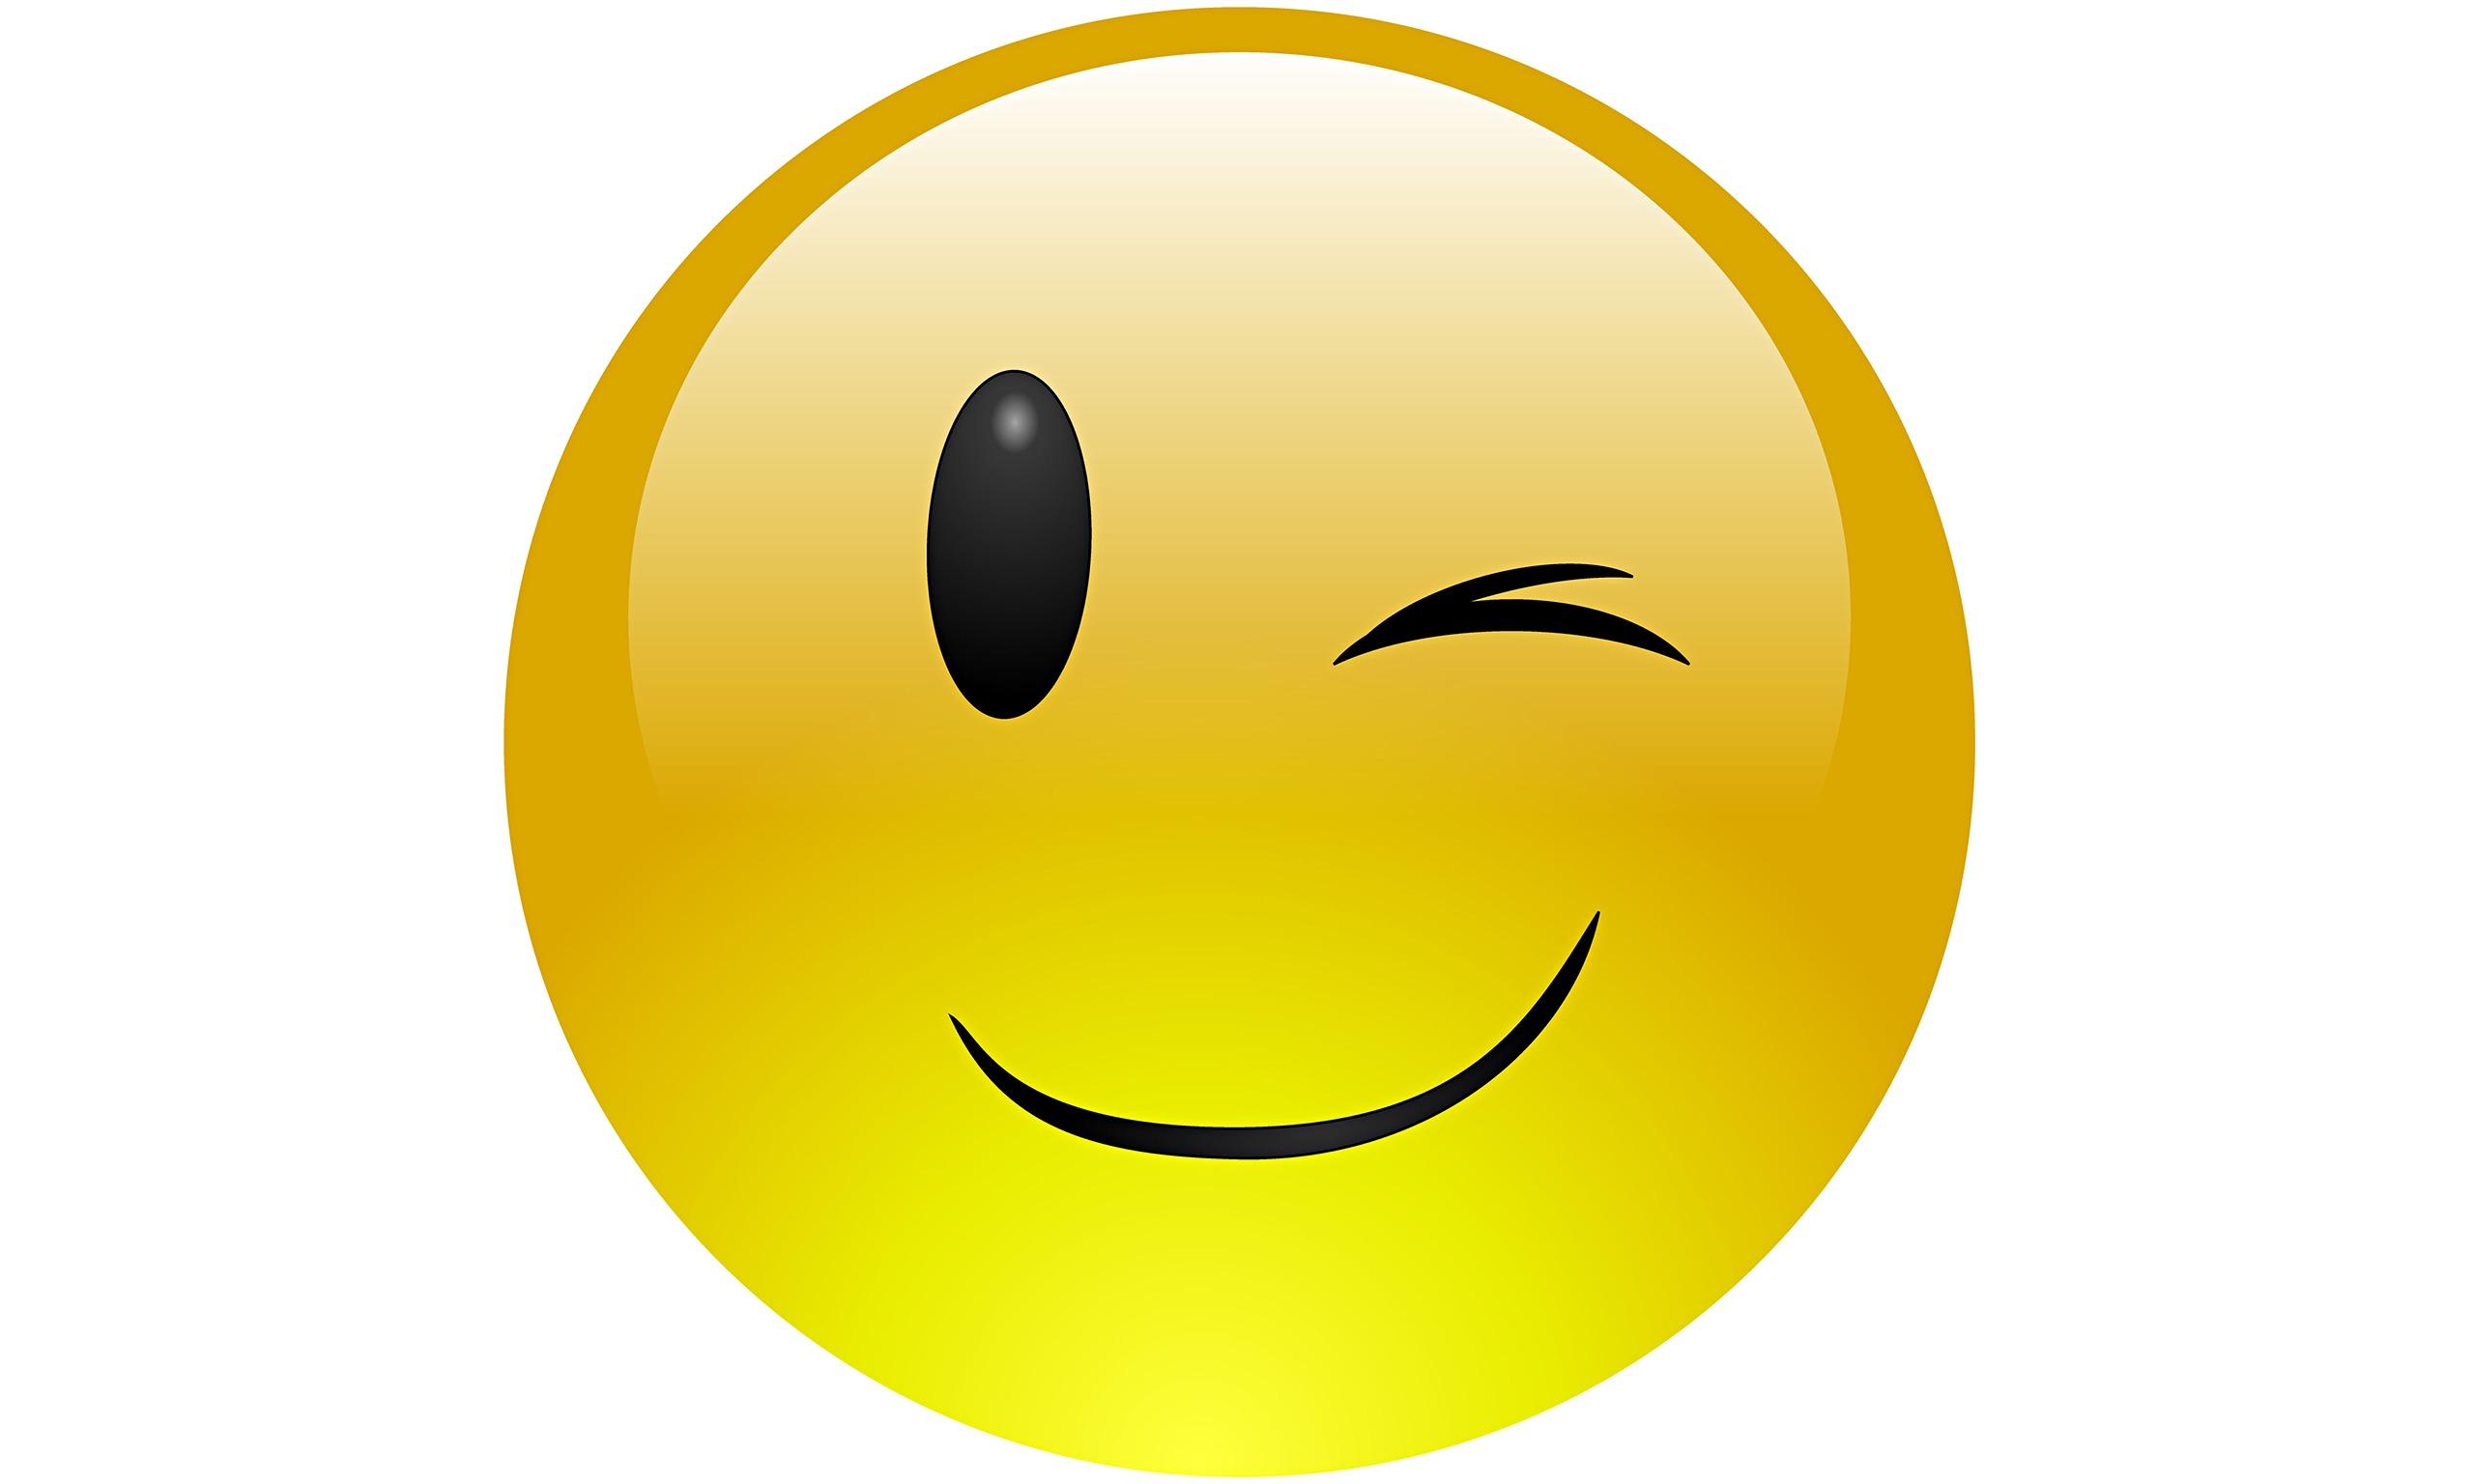 Adults who use emoji should grow up | David Webster ...